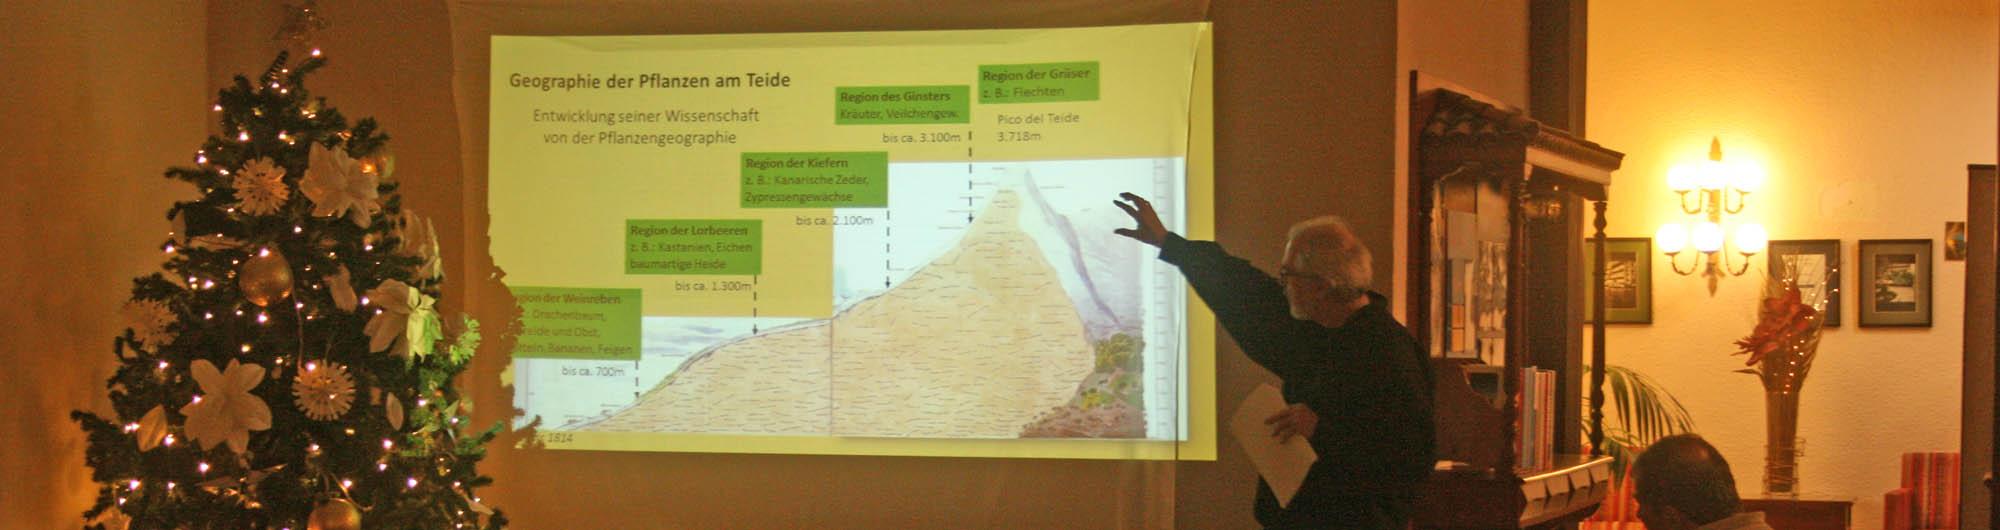 Vorträge über Humboldts Reiseweg zum Teide, Reinhold Mengel